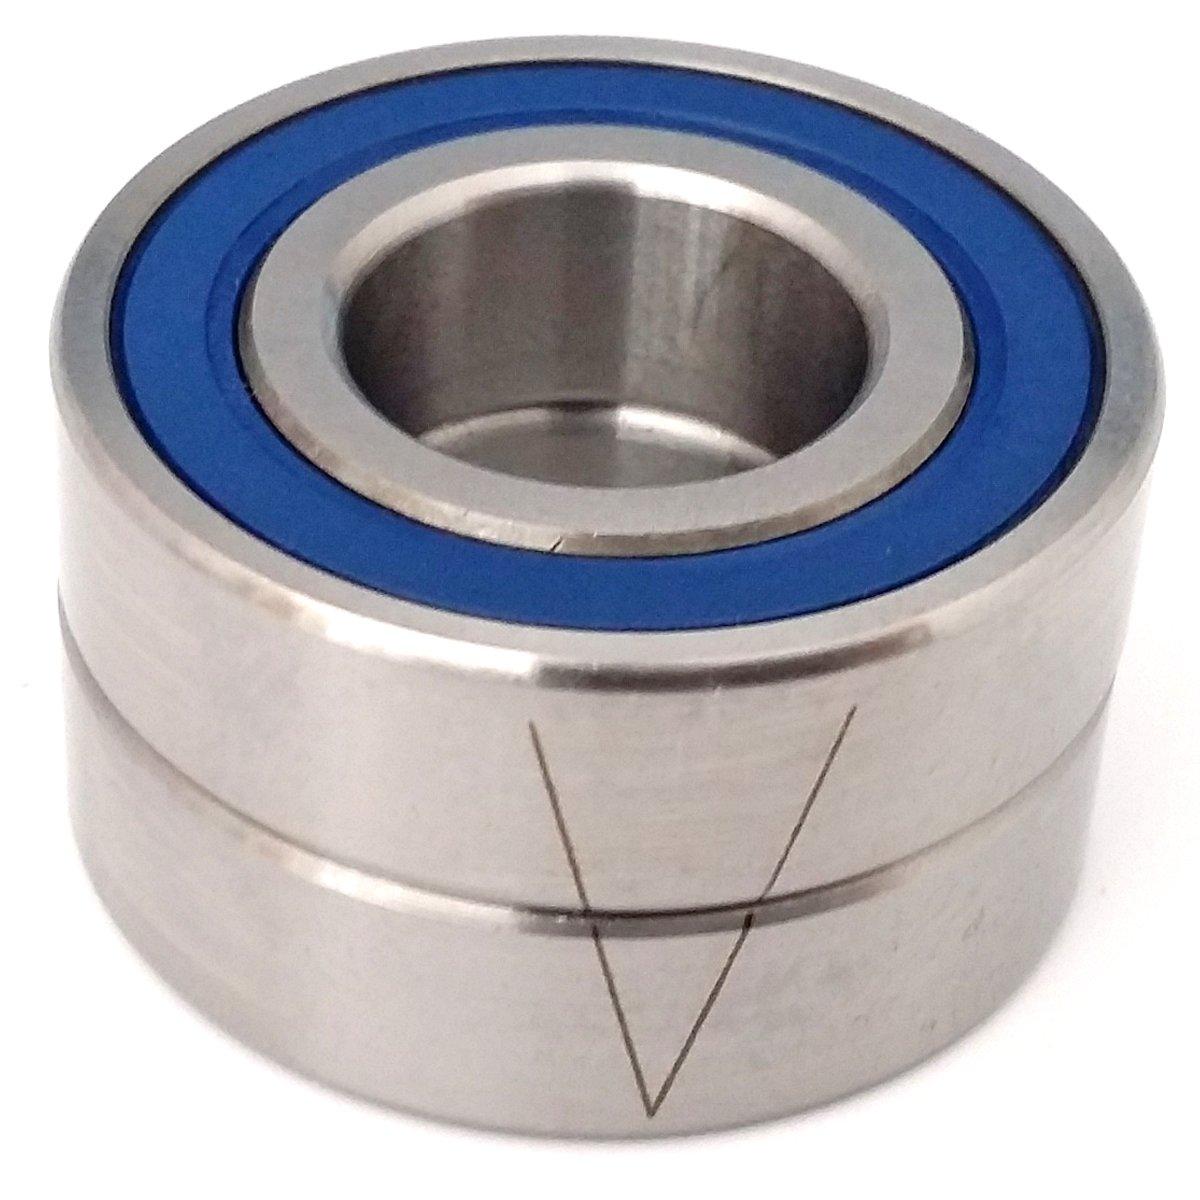 Ochoos 1pcs 7004 7004C 2RZ P4 20x42x12 Ochoos Sealed Angular Contact Bearings Speed Spindle Bearings CNC ABEC-7